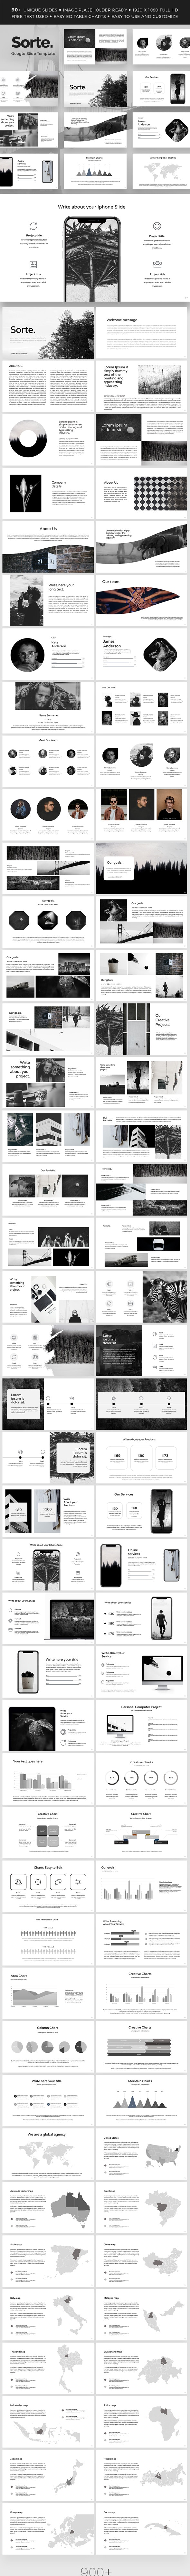 Sorte Google Slide Presentation Template - Google Slides Presentation Templates